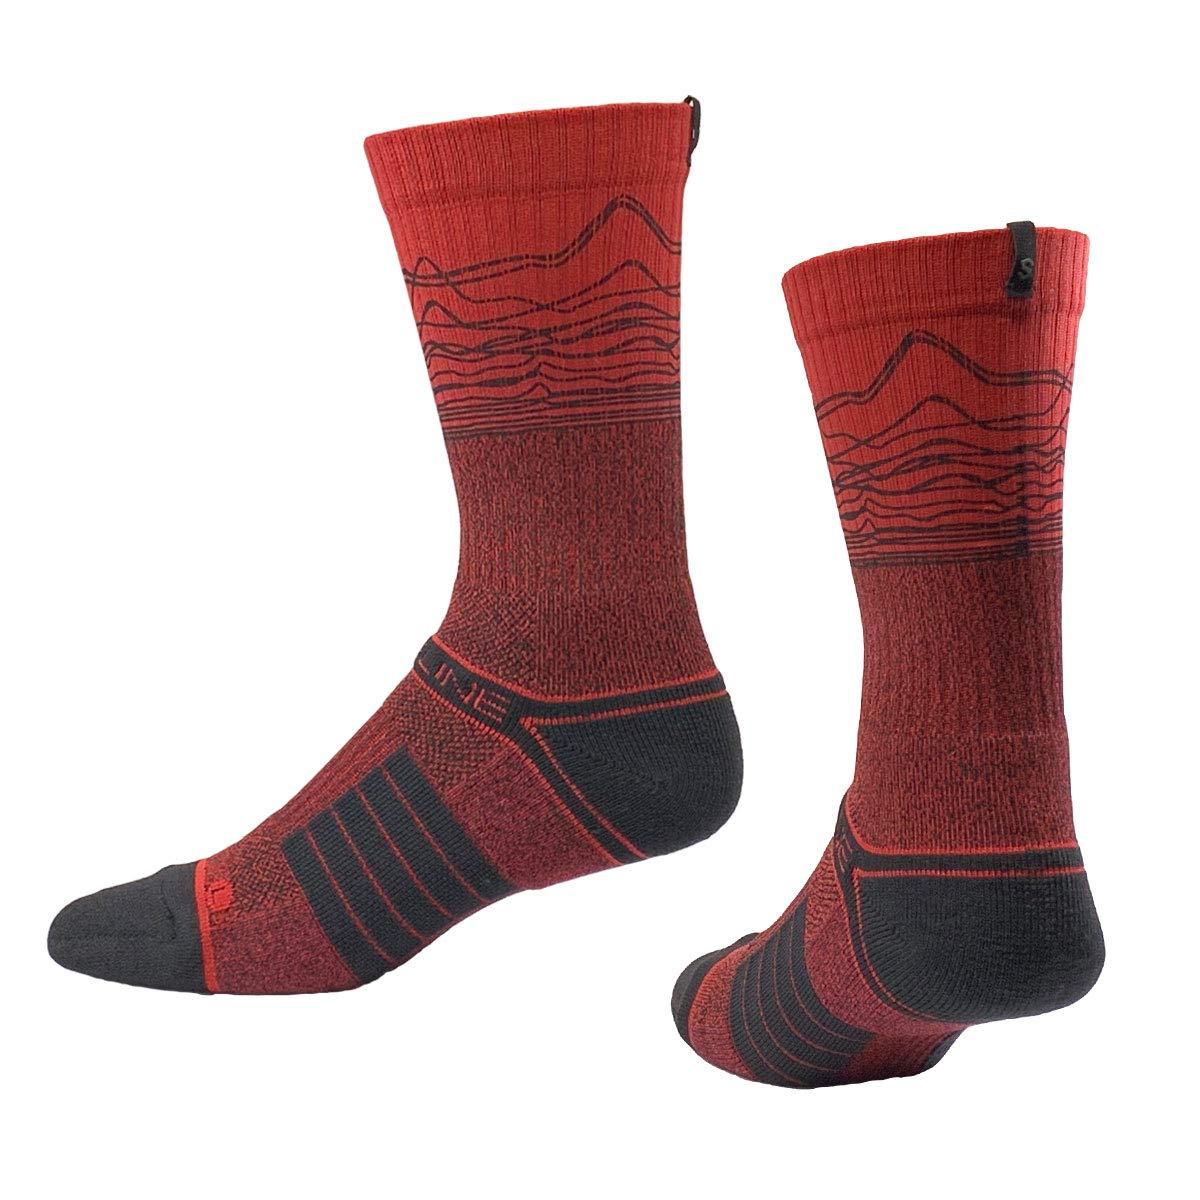 Strideline EKG Red Heartbeat Love Crew Socks